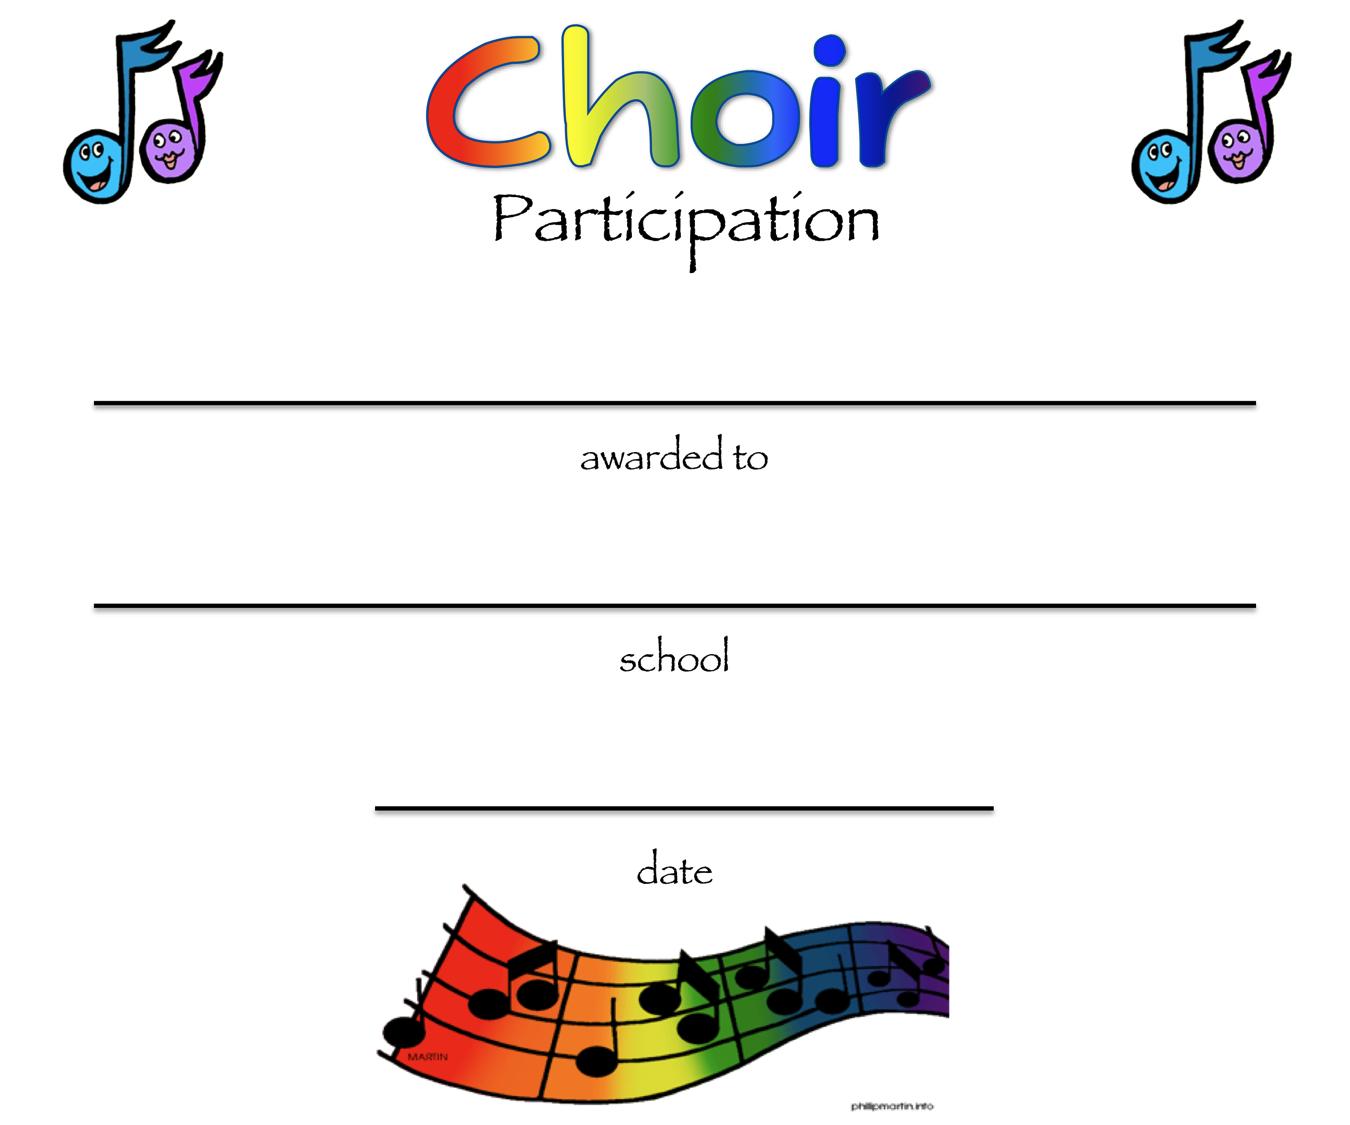 chorus certificates awards technologi information With choir certificate template